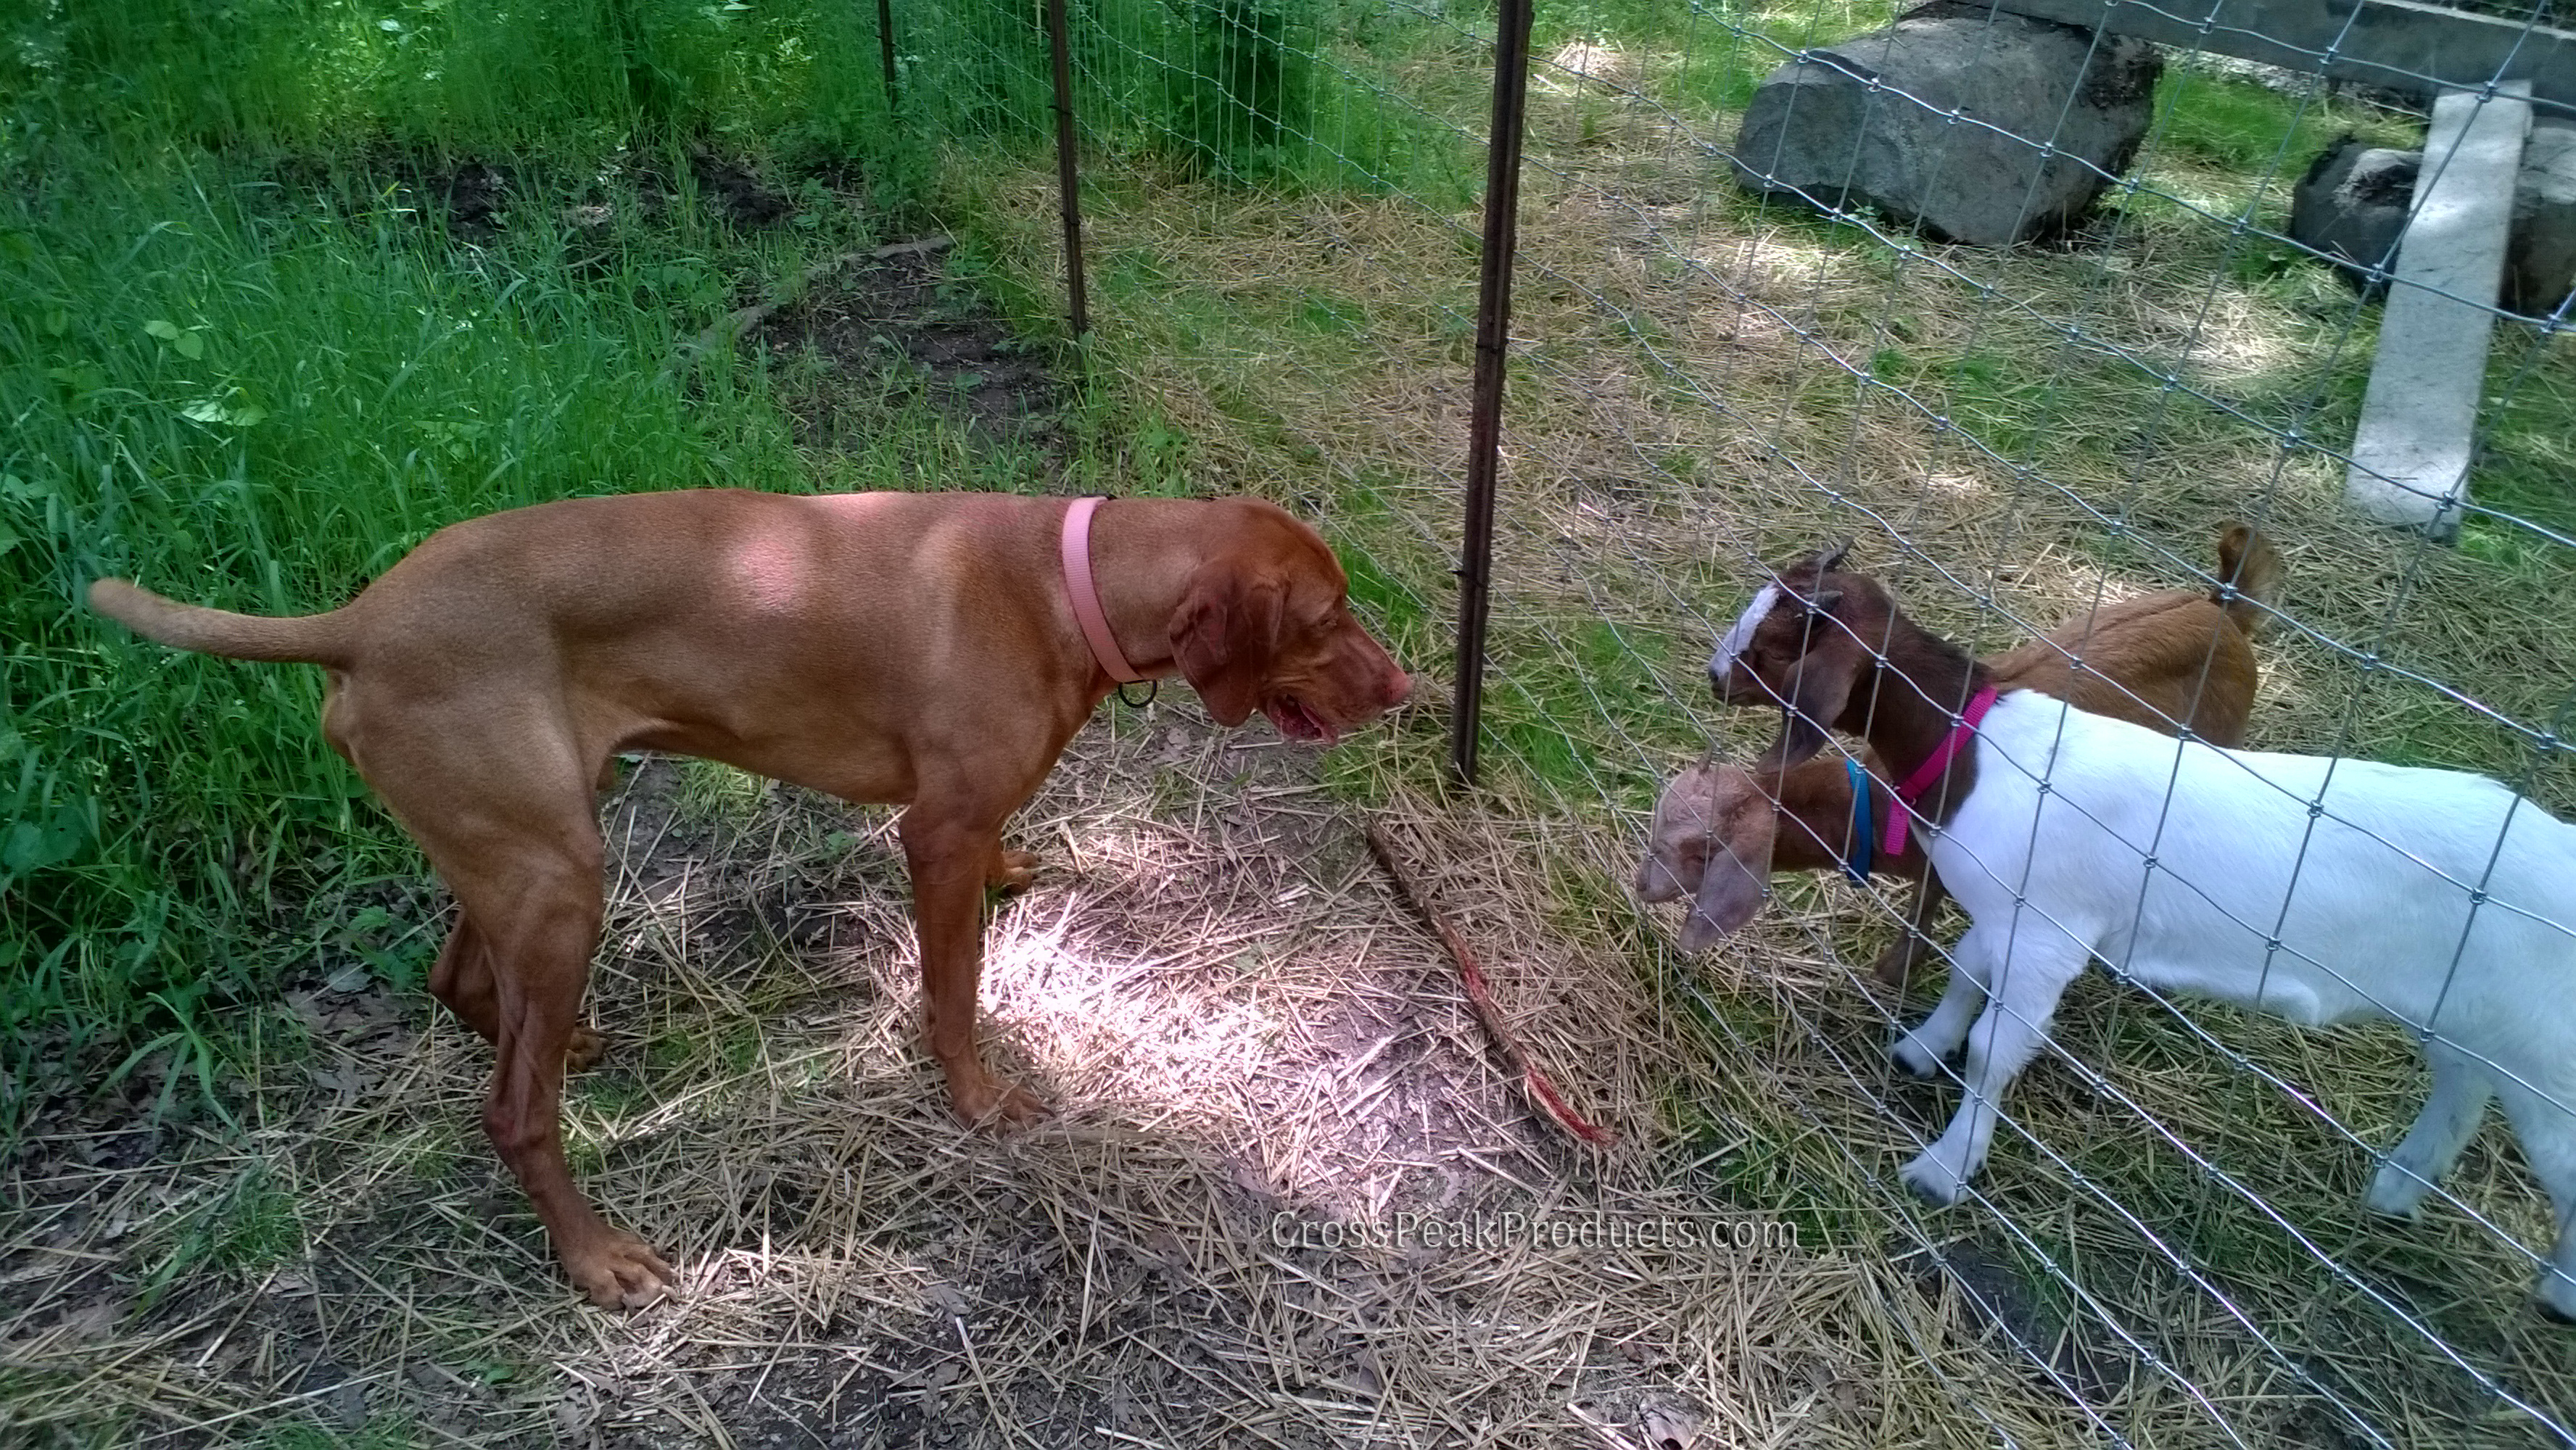 vizsla dog playing with goats